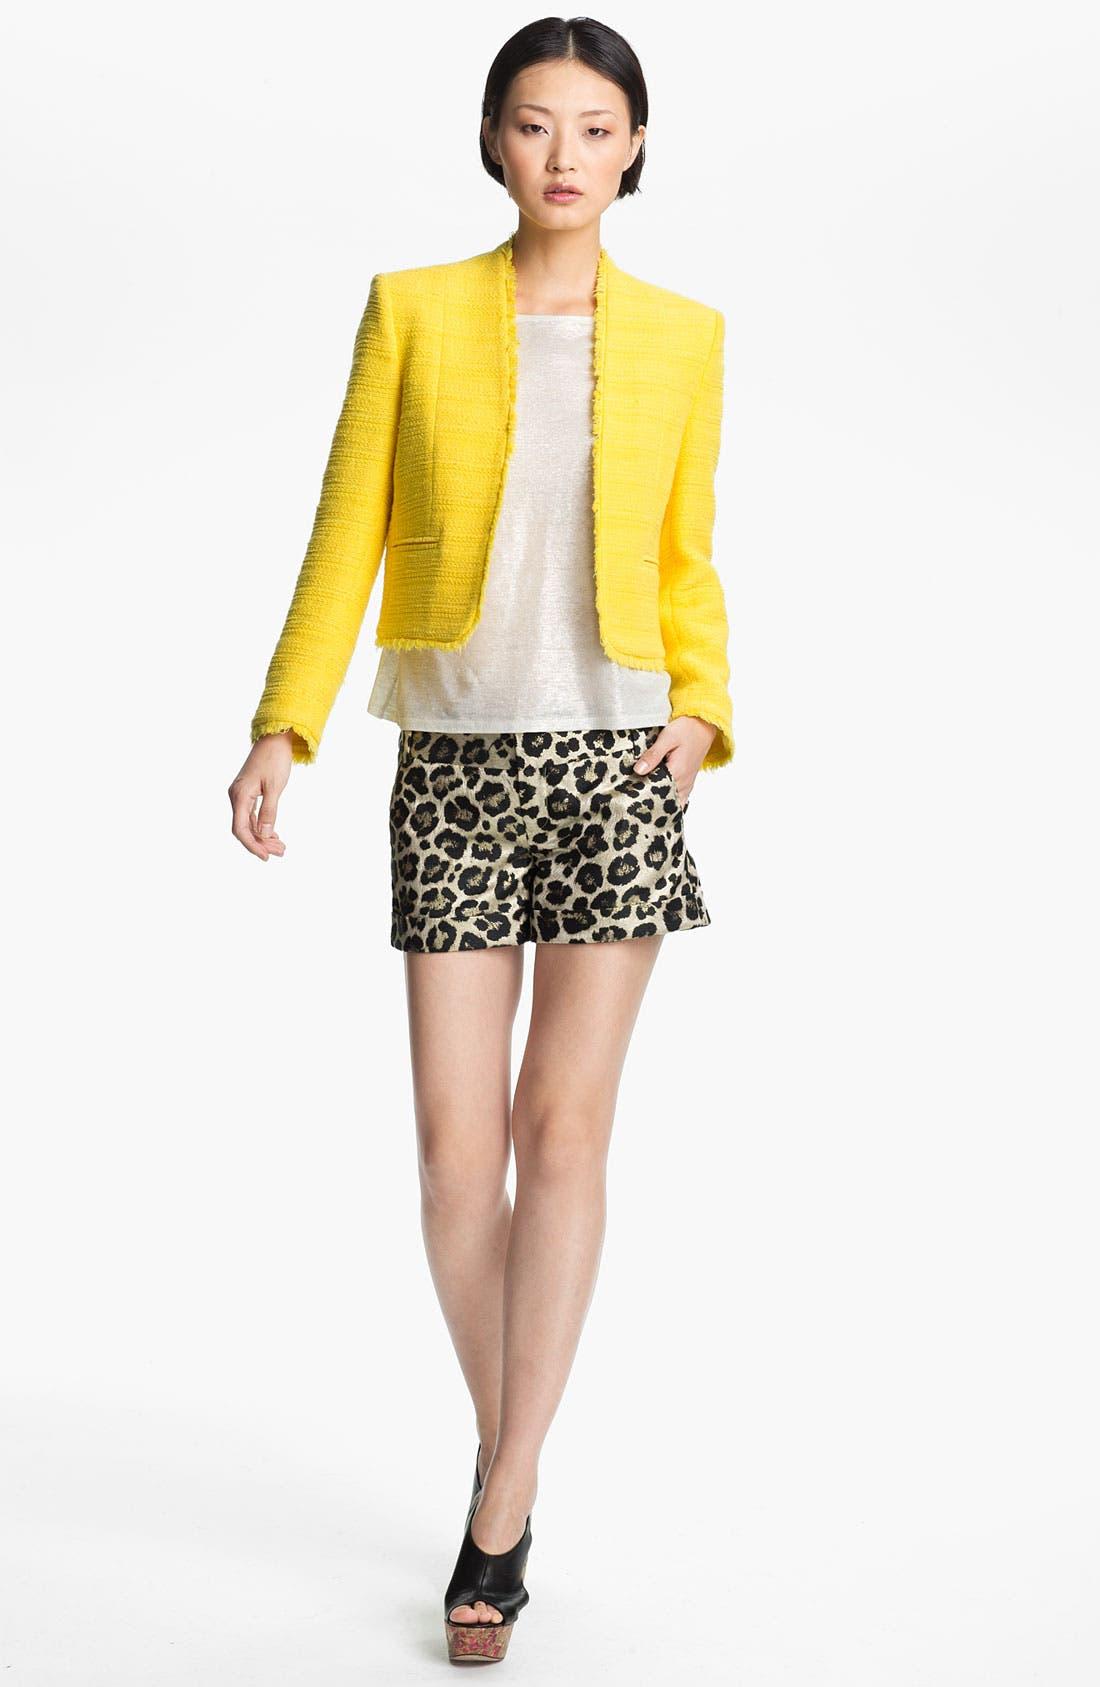 Alternate Image 1 Selected - Alice + Olivia 'Princeton' Tweed Jacket